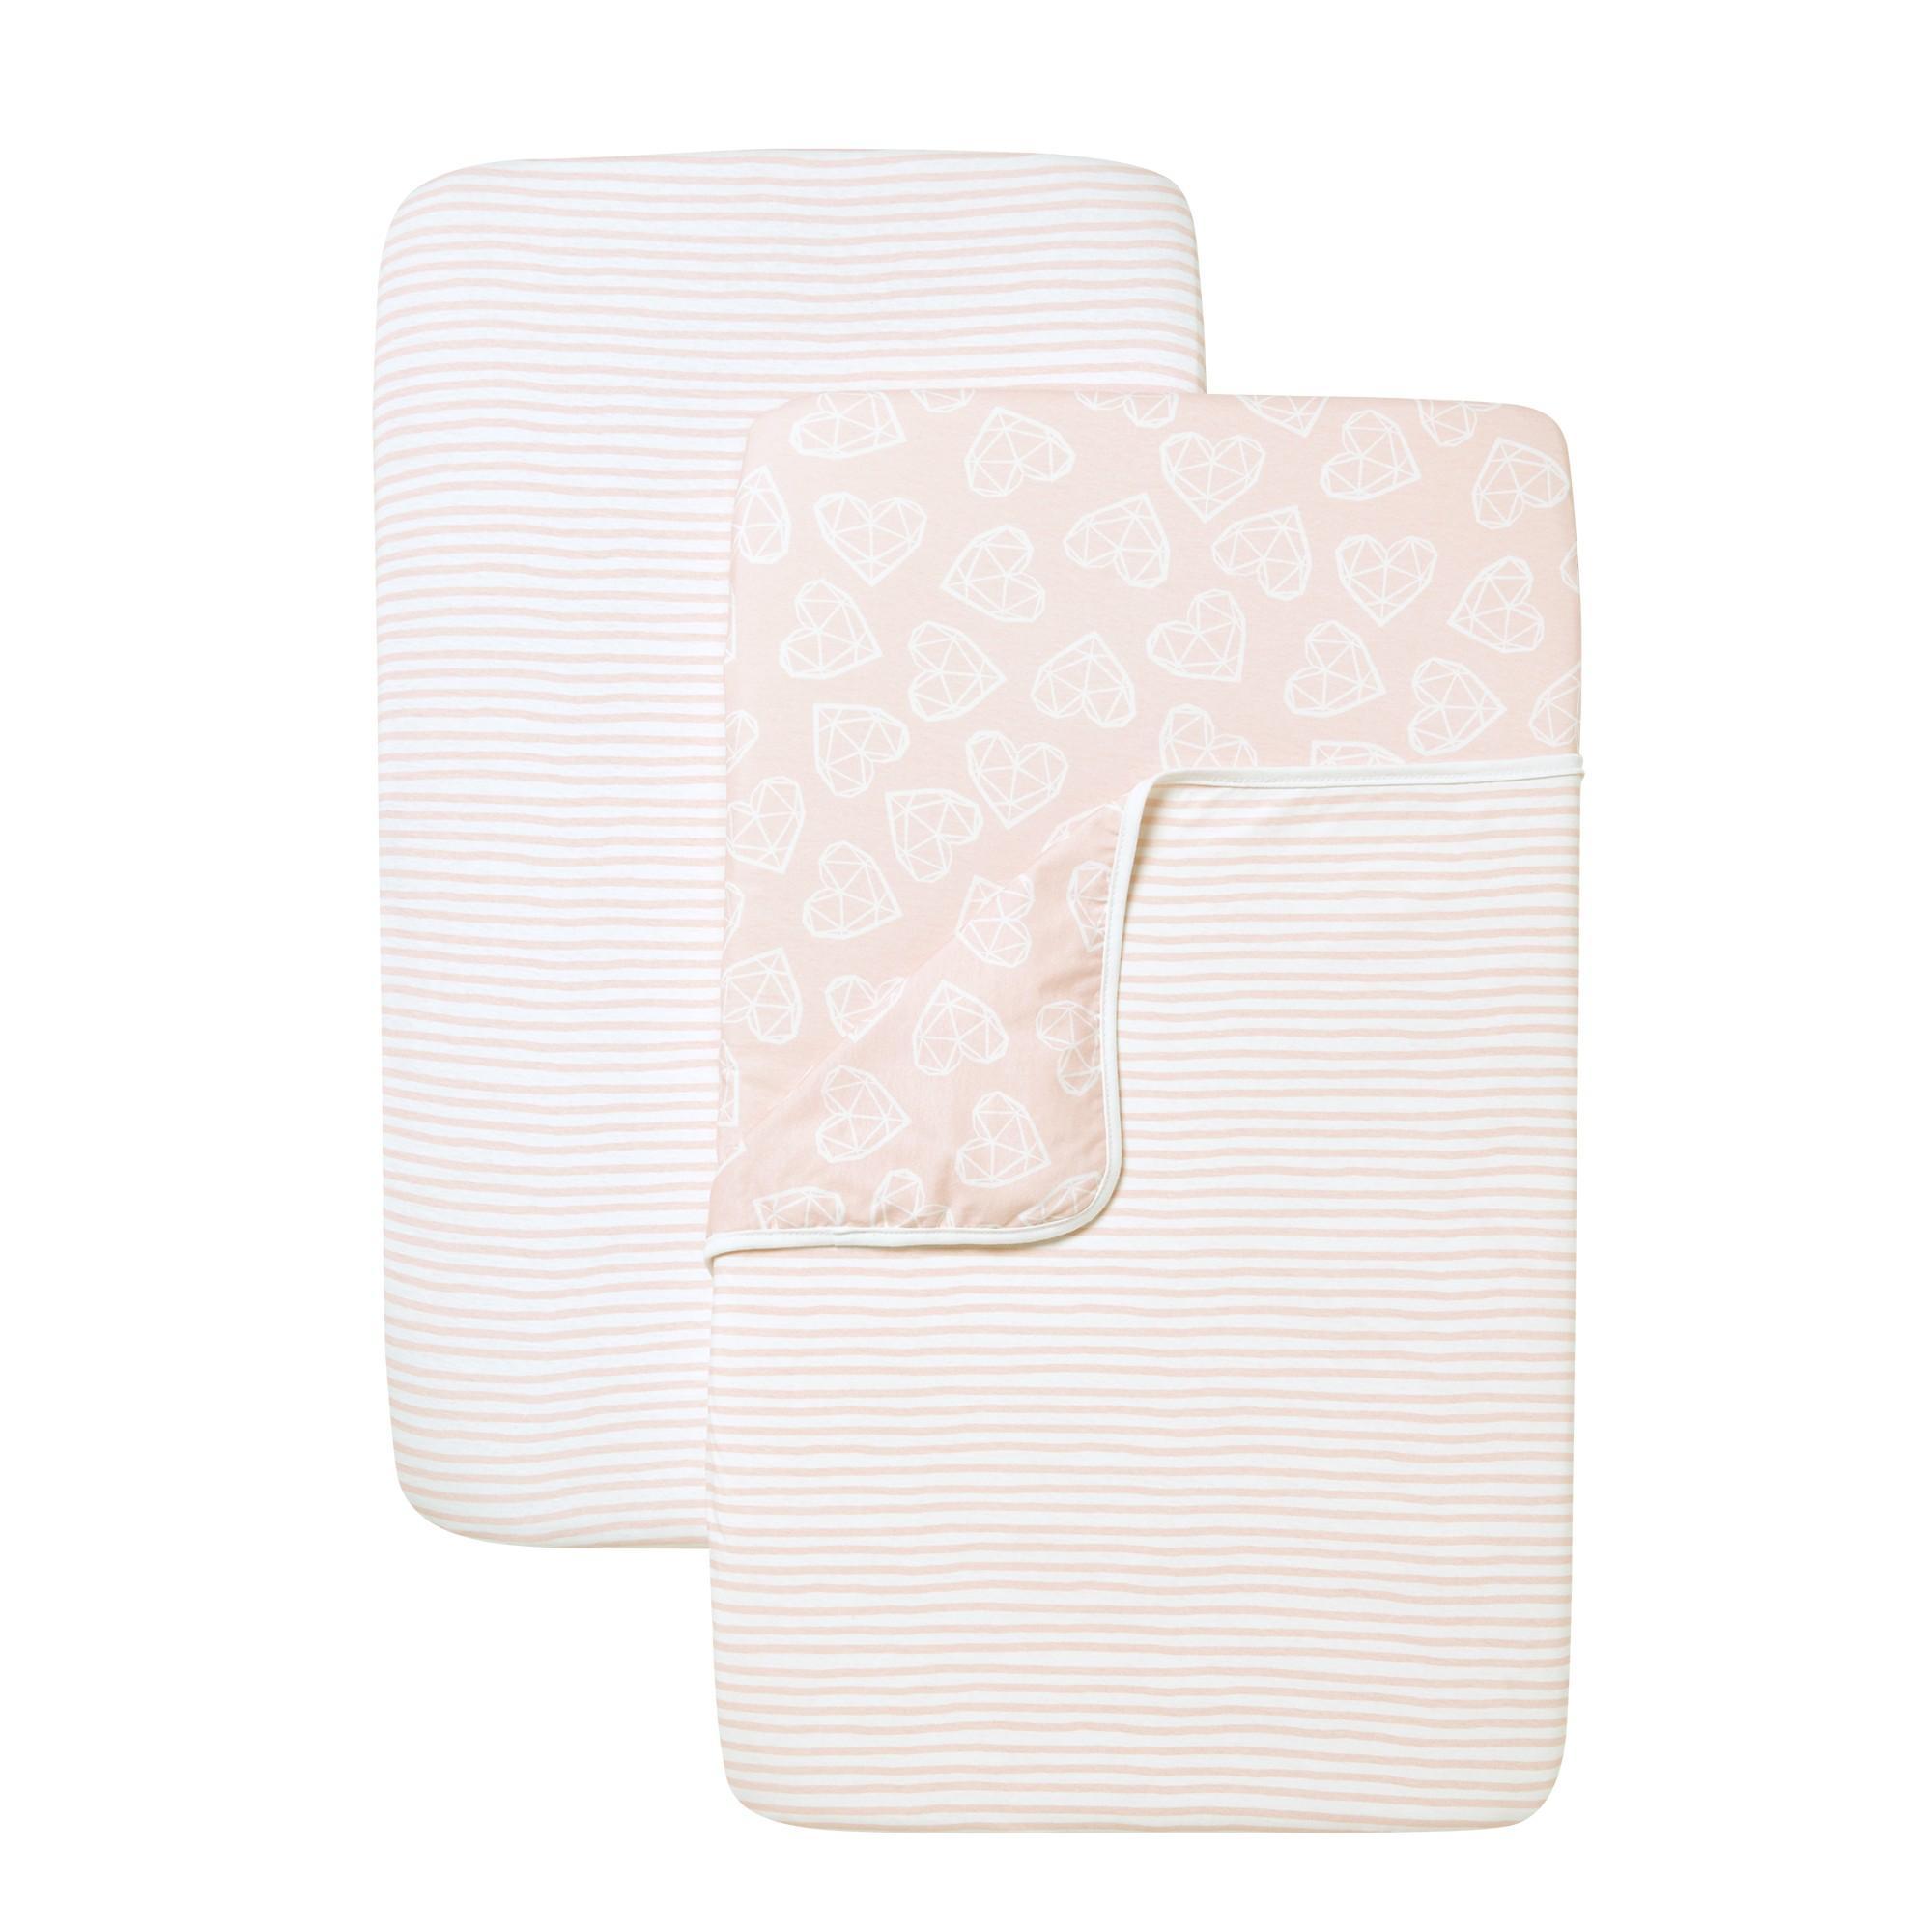 Shnuggle - Air Kinderbedje Set 2 Hoeslakens + 1 Lakentje Pink